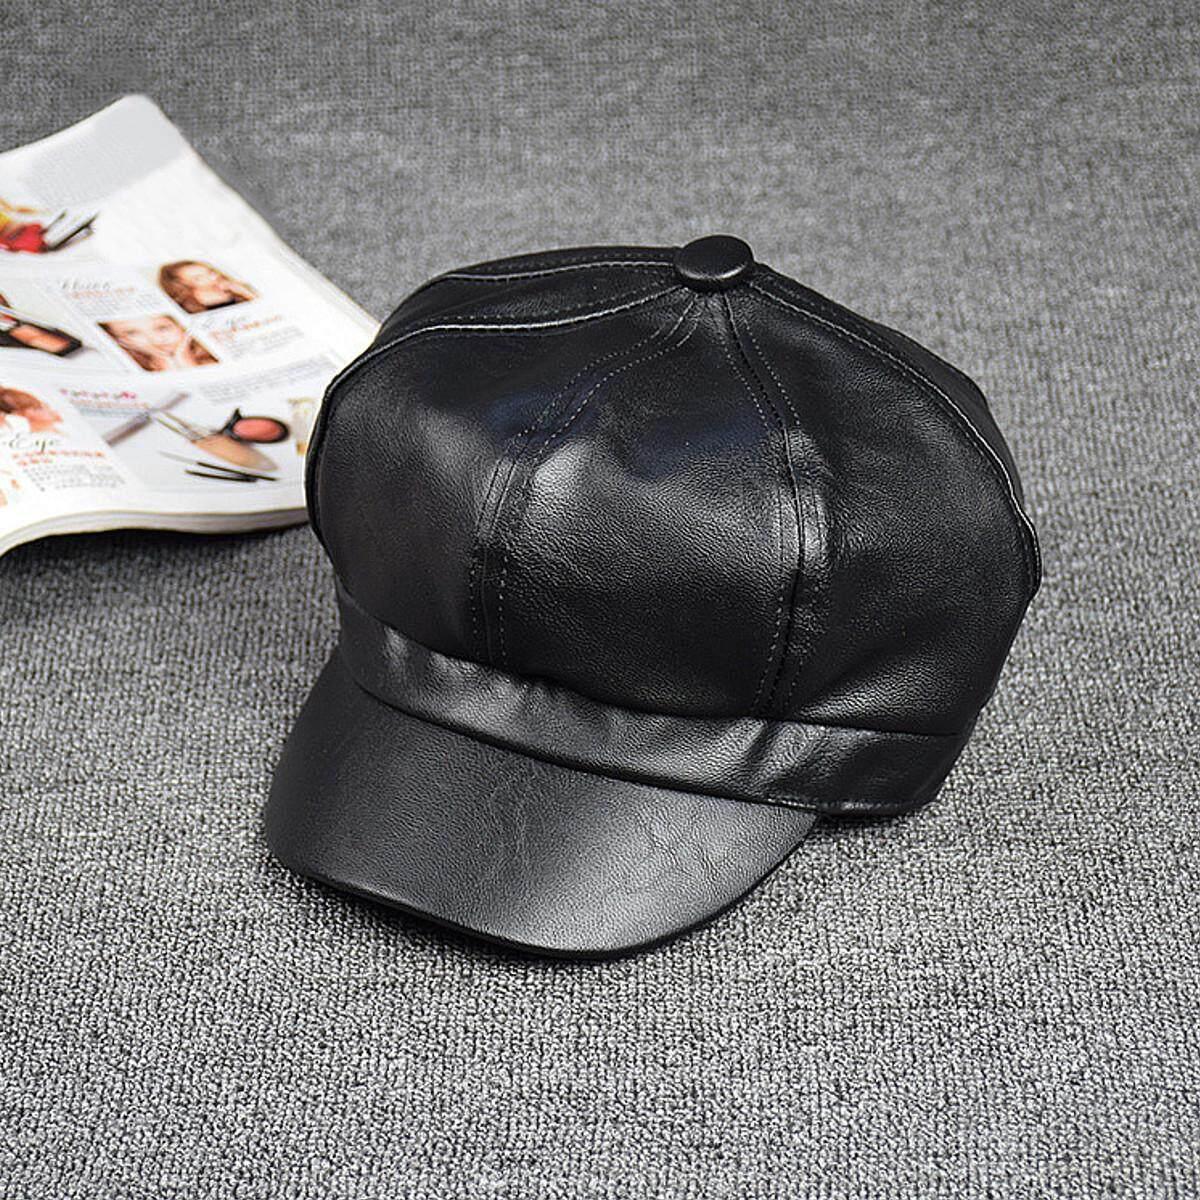 Wanita Kulit Hitam Topi Segi-delapan Baret Fashion Vintage Seniman Cap Kecantikan Topi Outdoor Topi Runcing